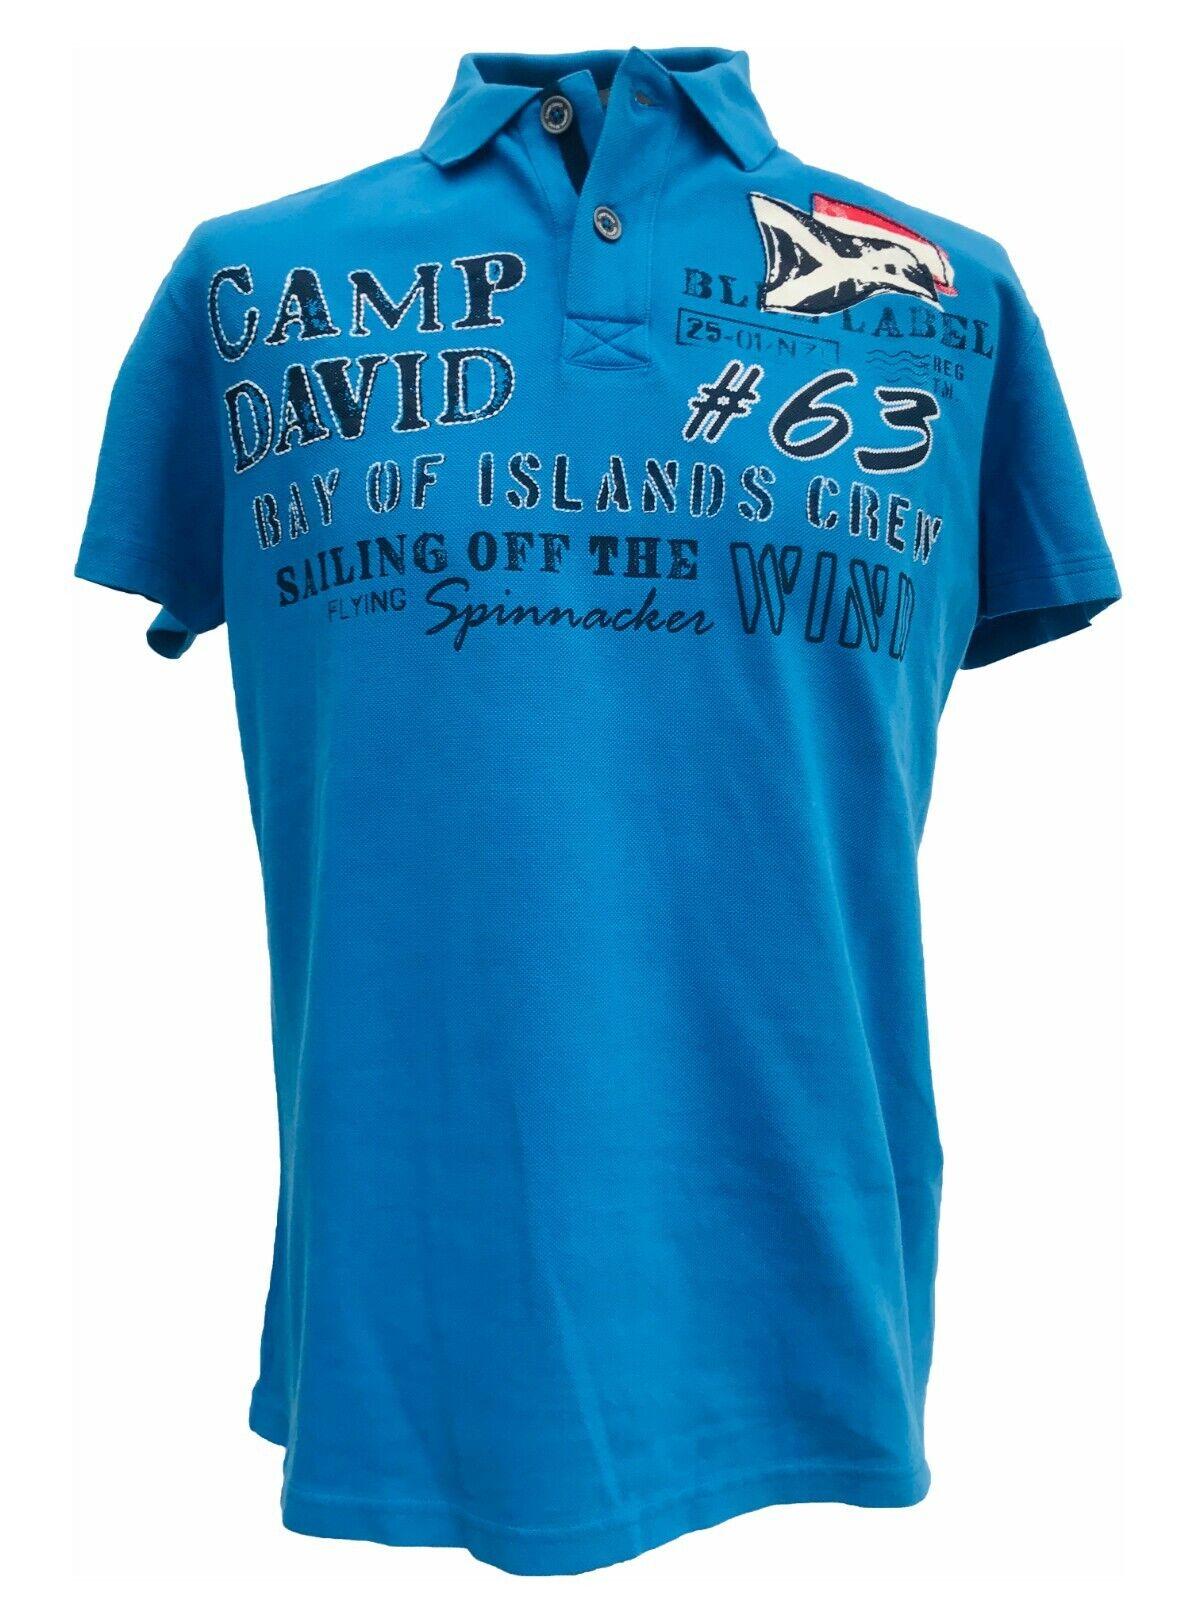 NEU Camp David Herren Poloshirt Big Deal I FS 18  Shirt Polo kurzarm M - XXXL   Tadellos